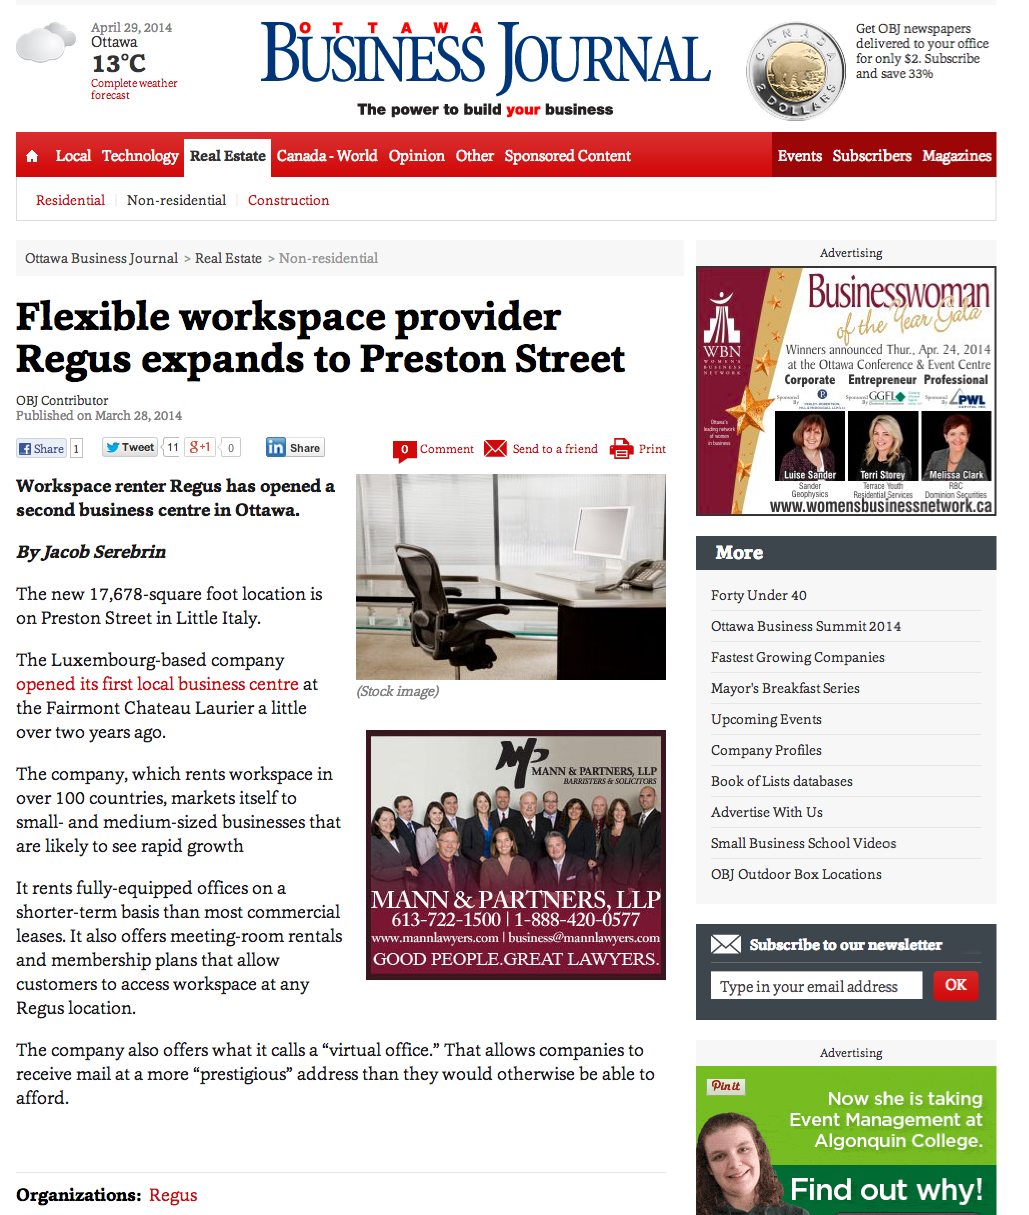 Regus in Ottawa Business Journal